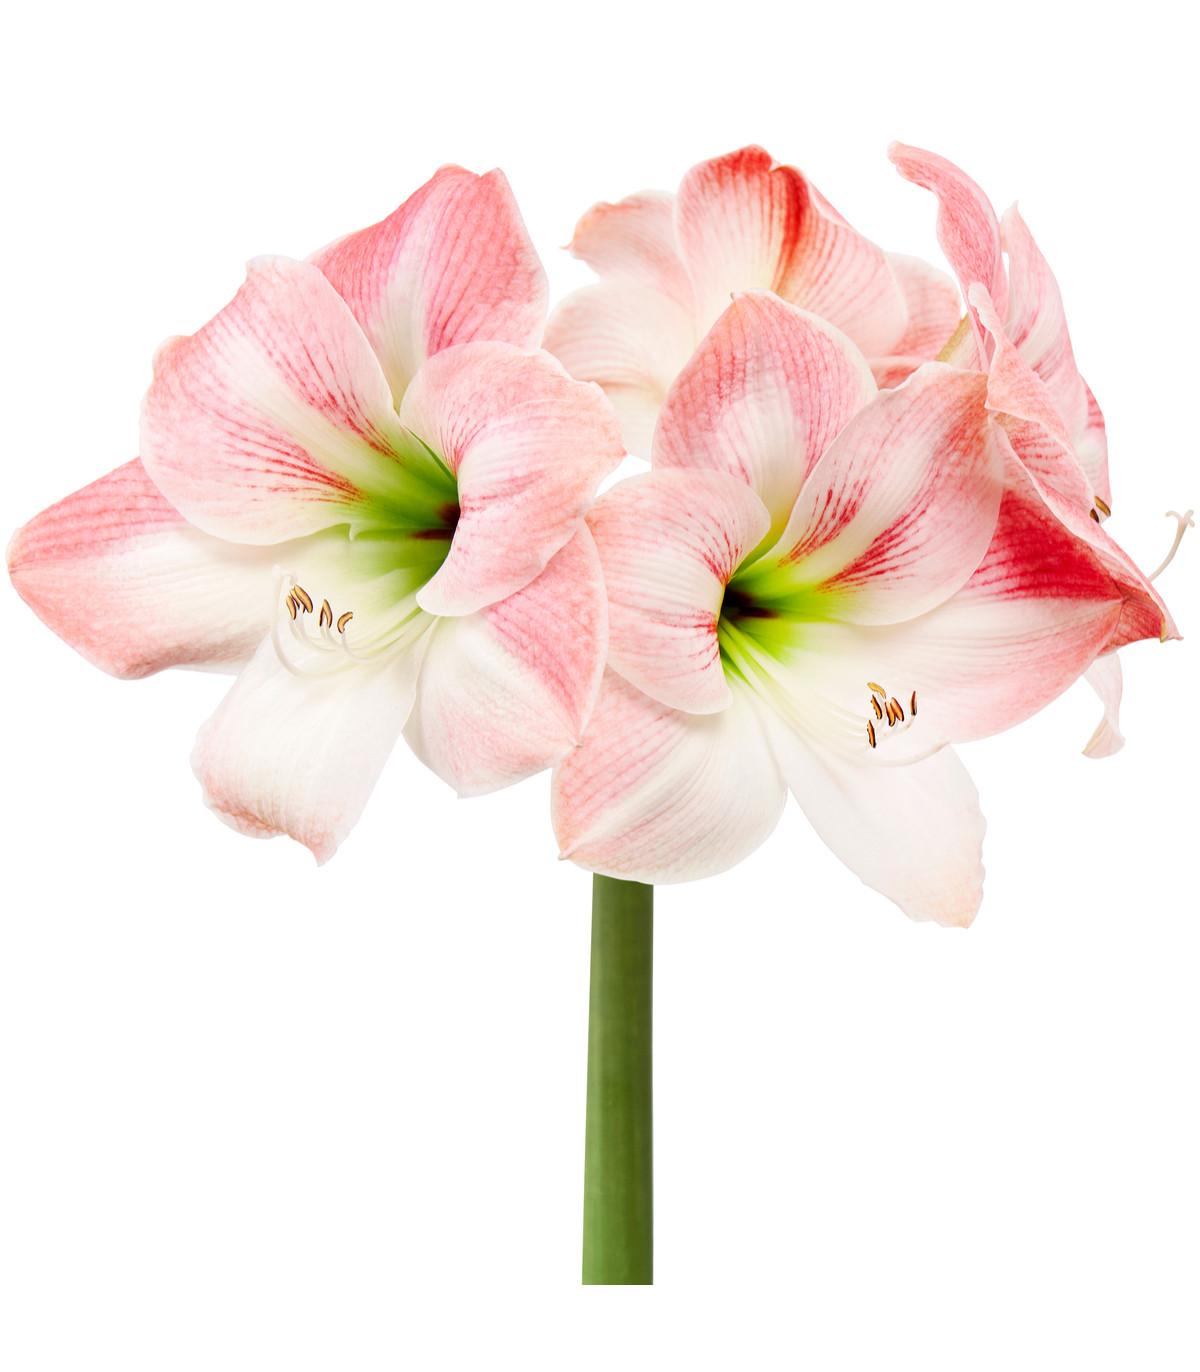 Amarylis Apple Blossom - Zornica - cibuľa amarylis - 1 ks